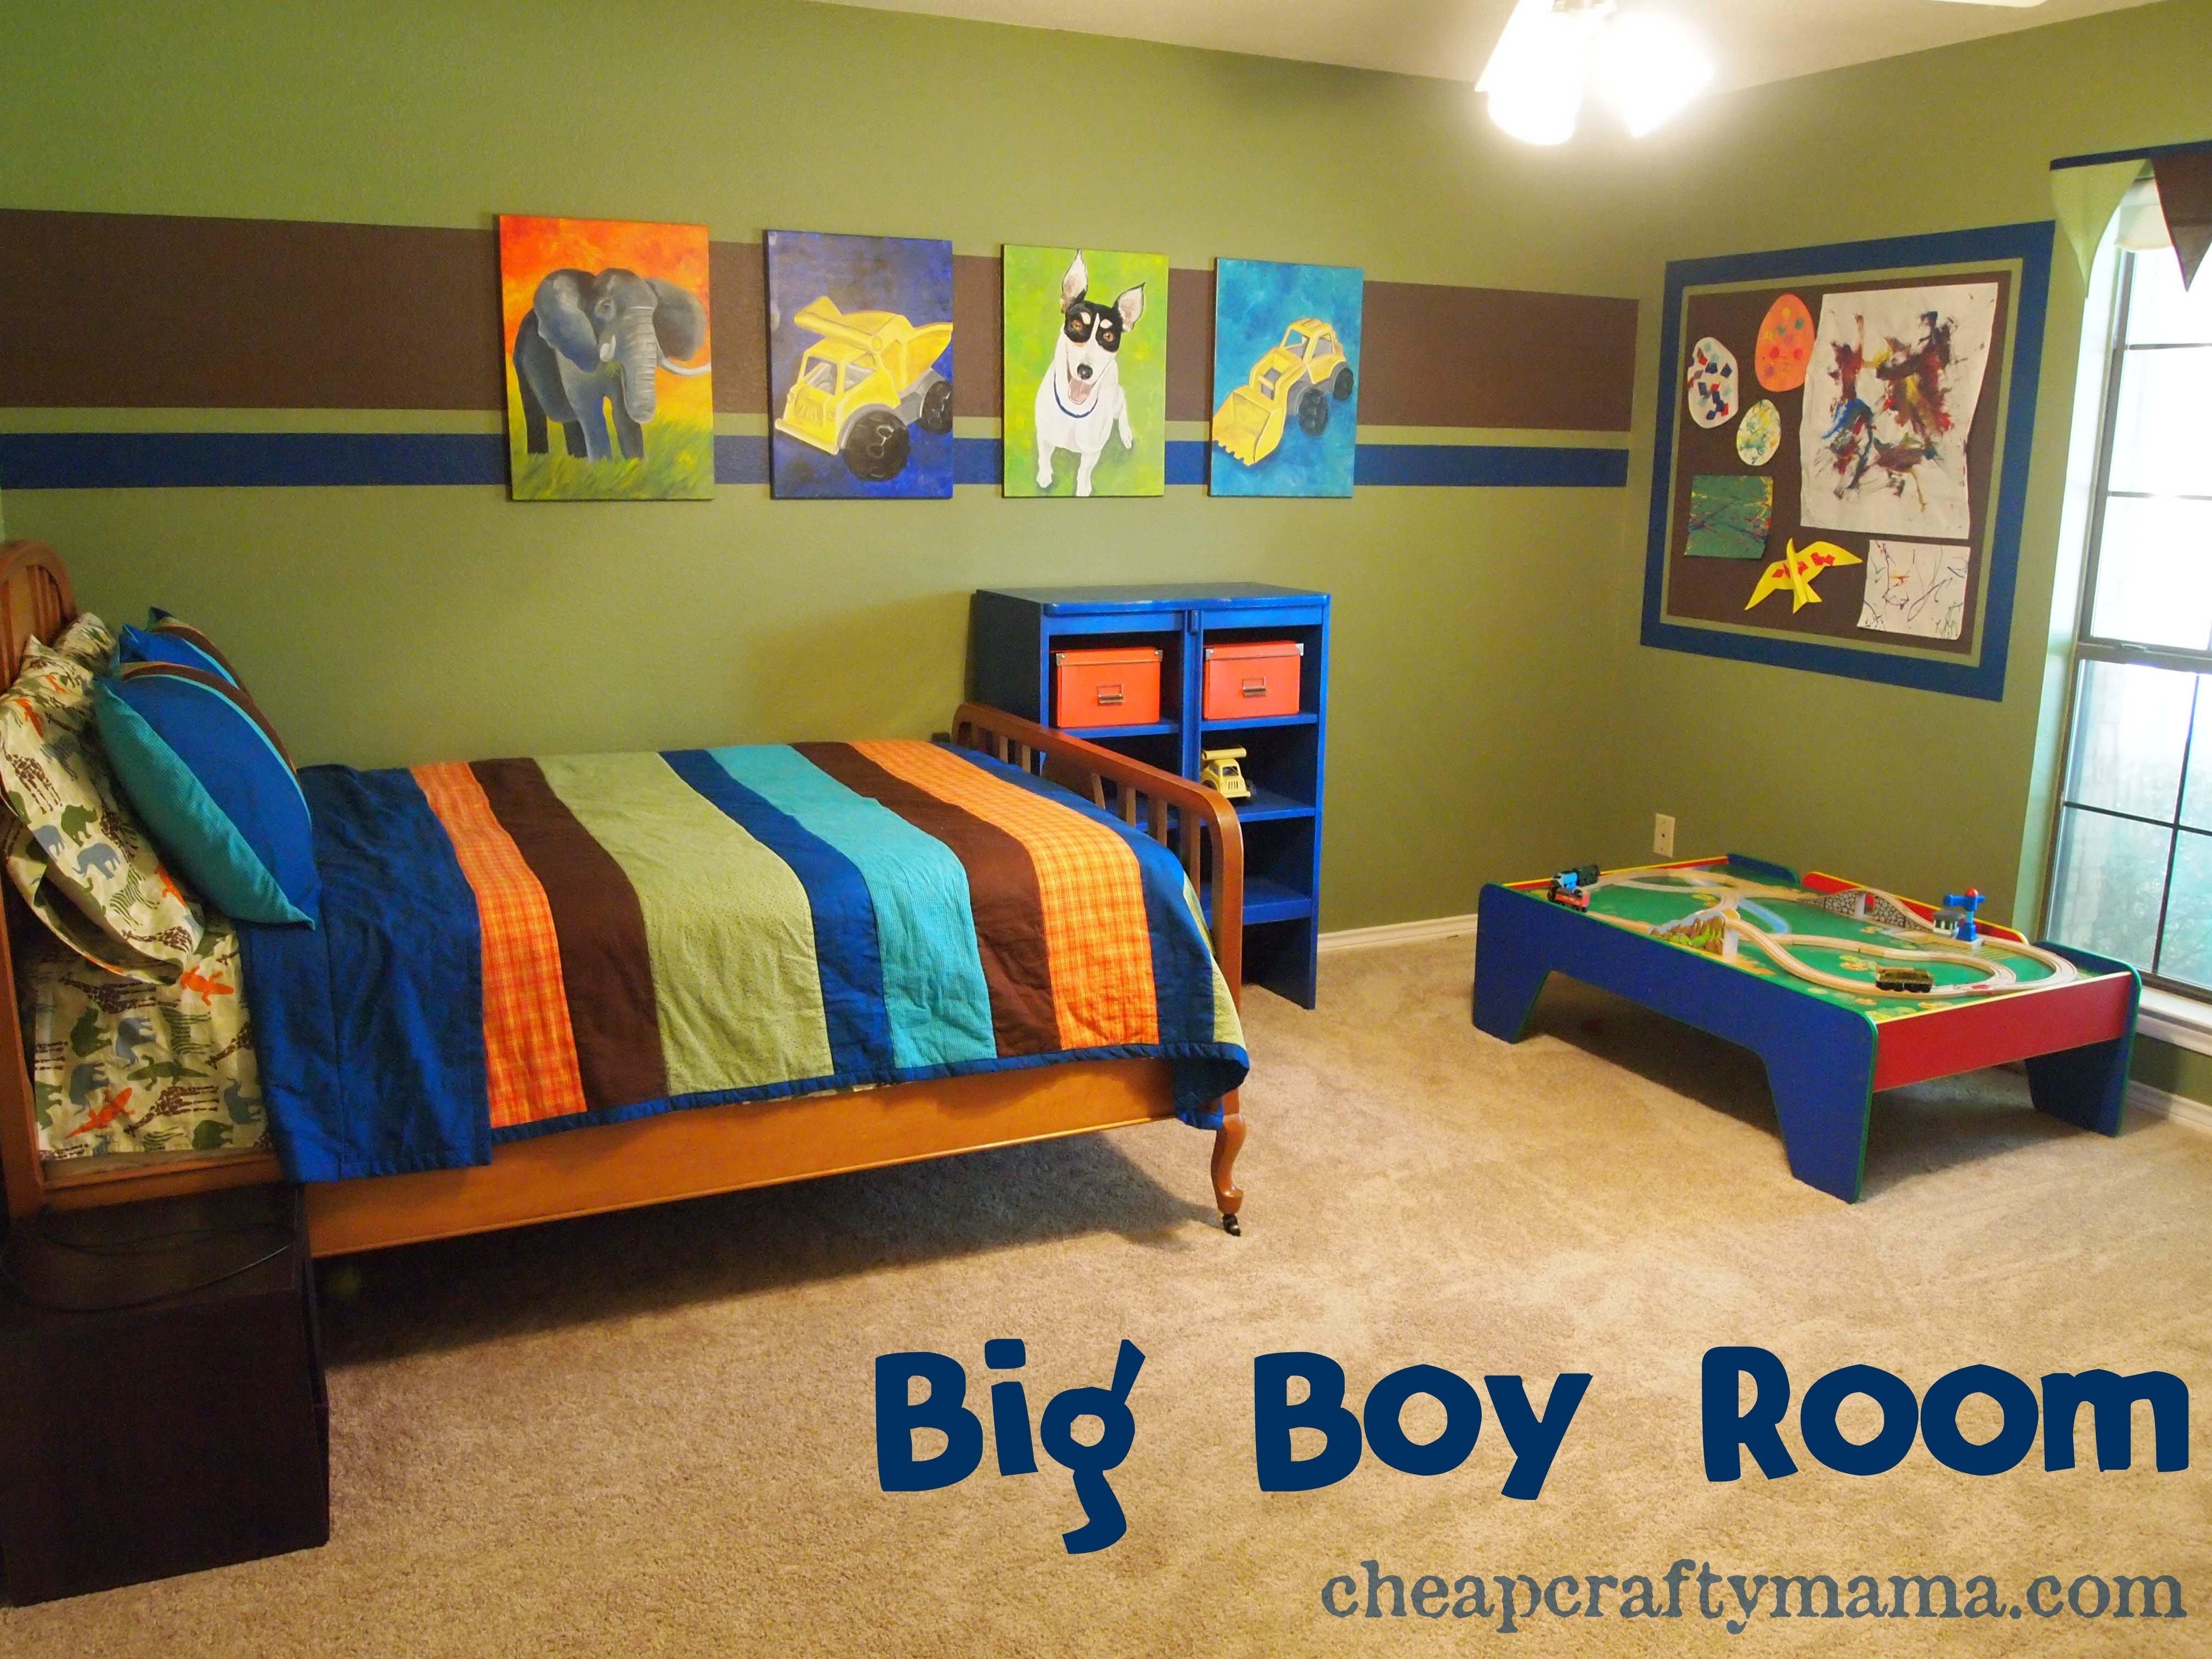 10 Nice Toddler Boy Room Decorating Ideas bedroom kids room paint colors toddler boy room decor boy room